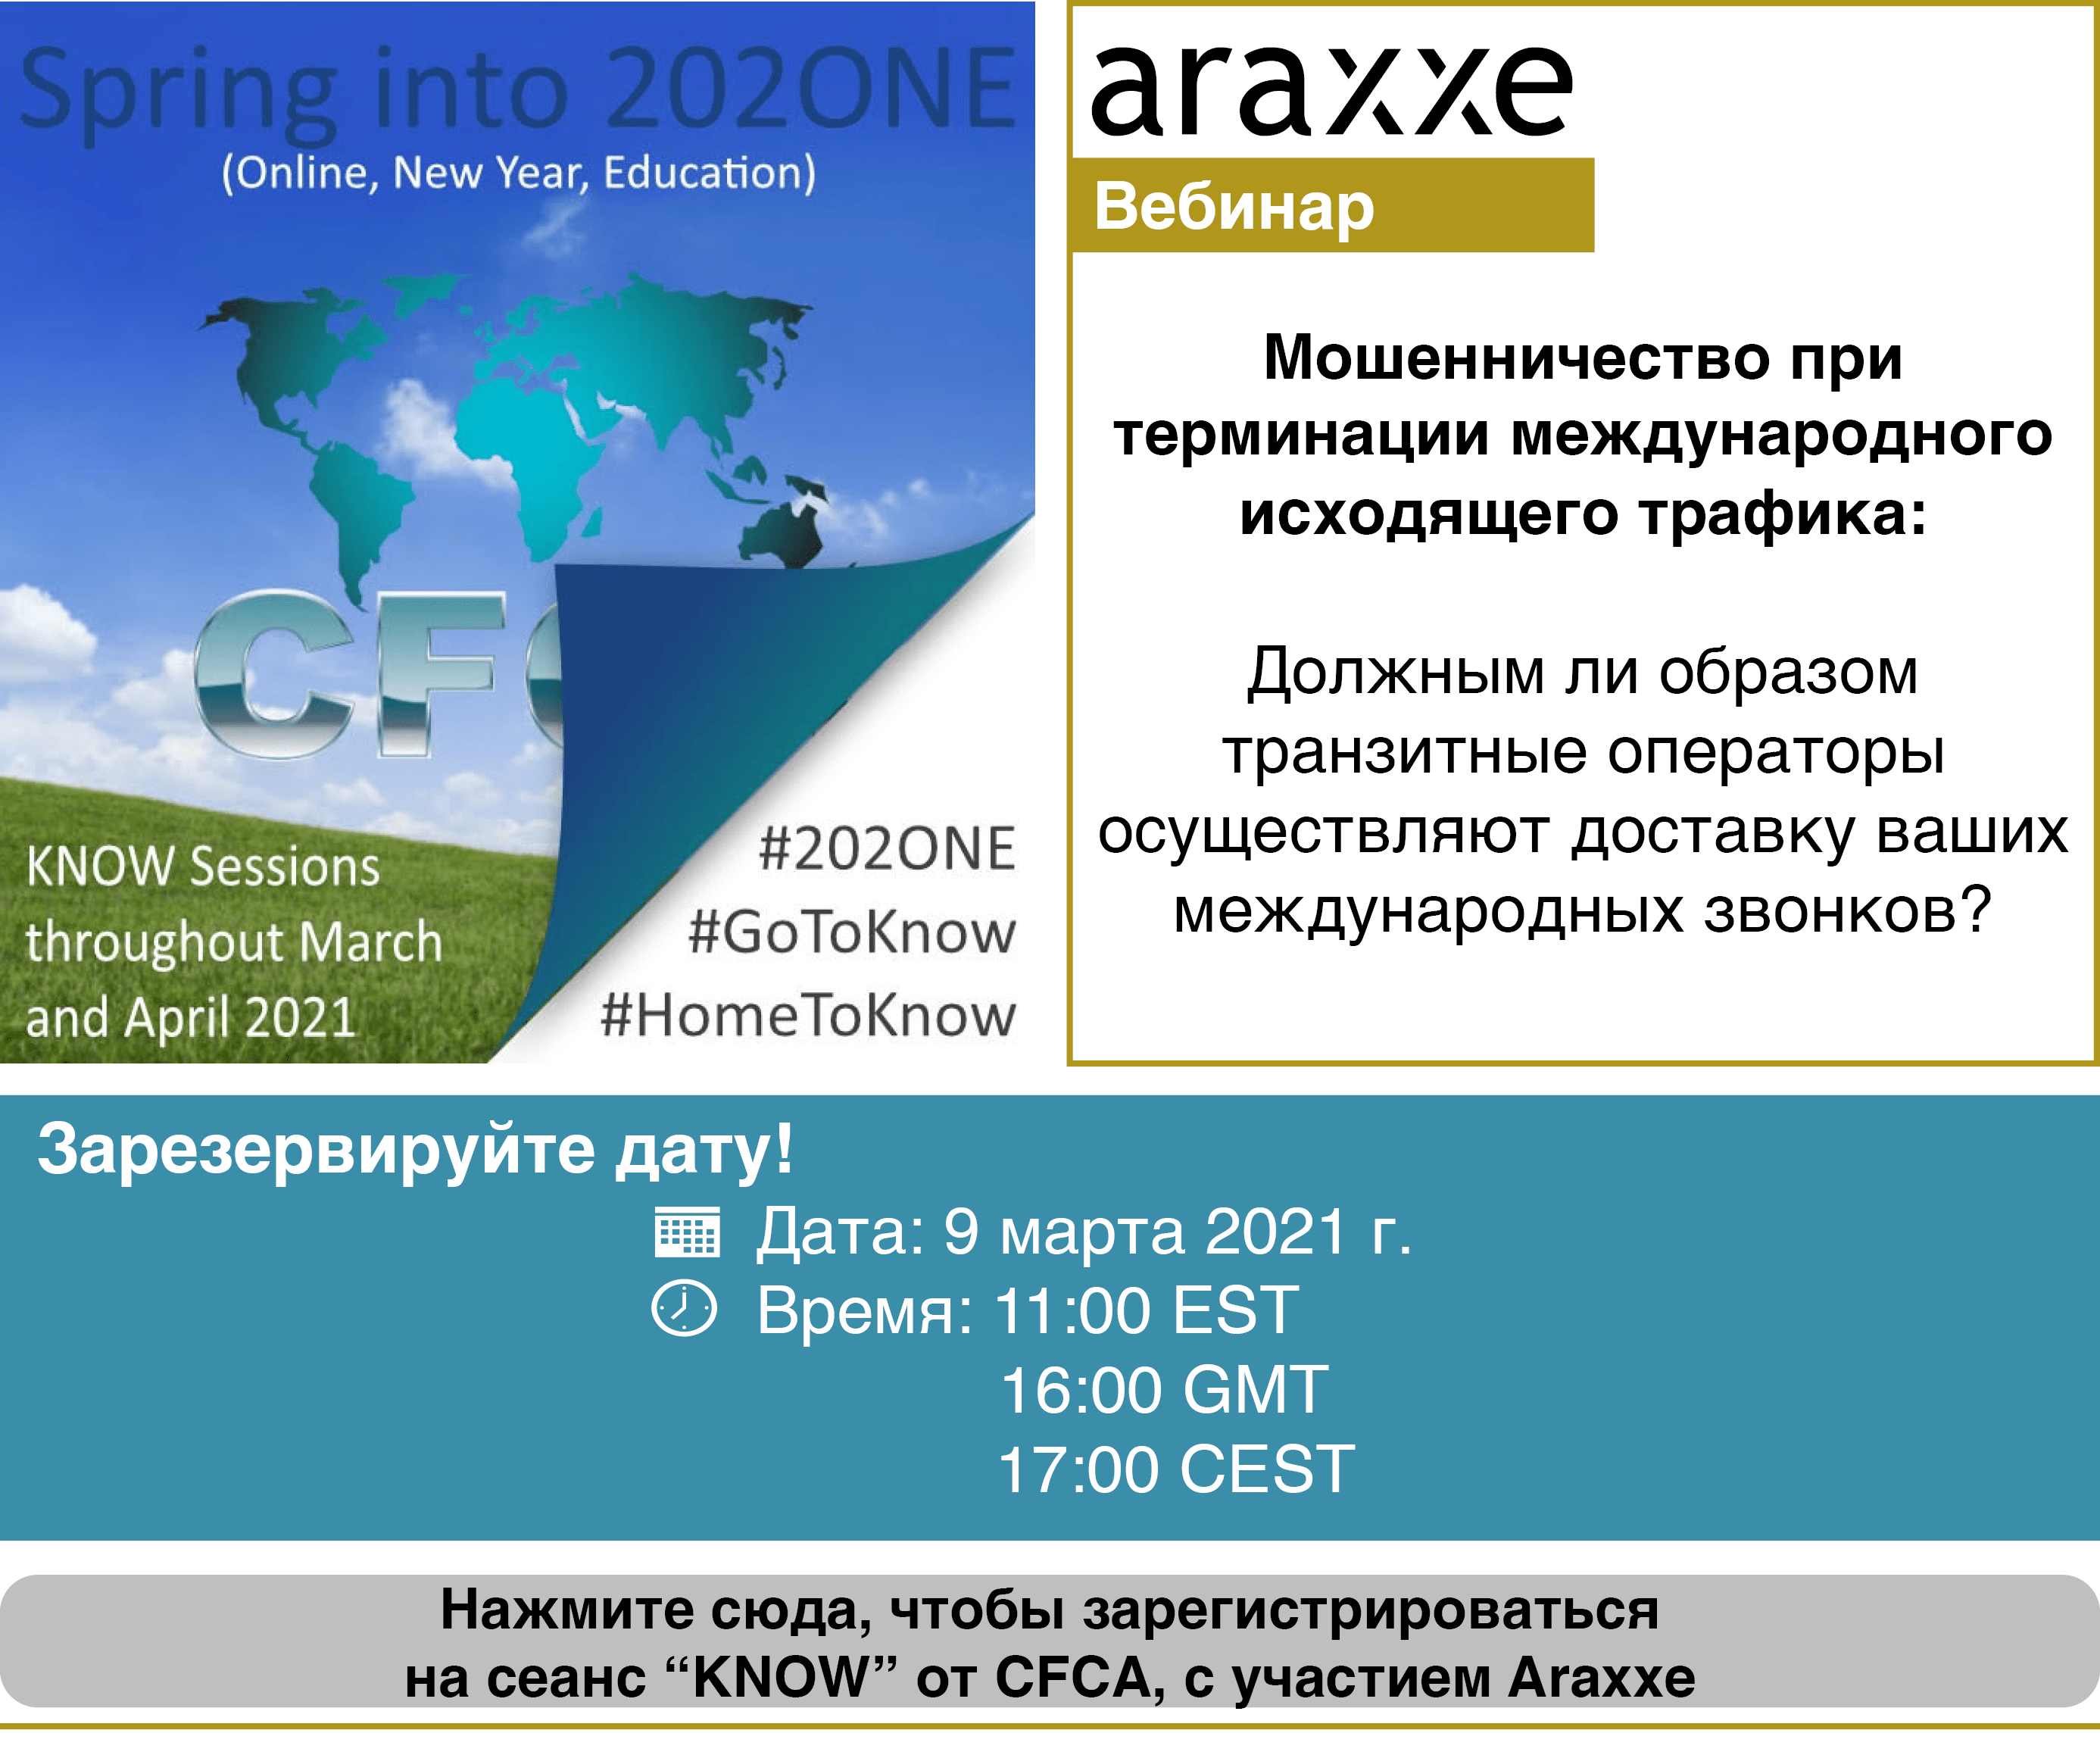 CFCA and Araxxe Webinar - International Outbound Termination Fraud - March 9th